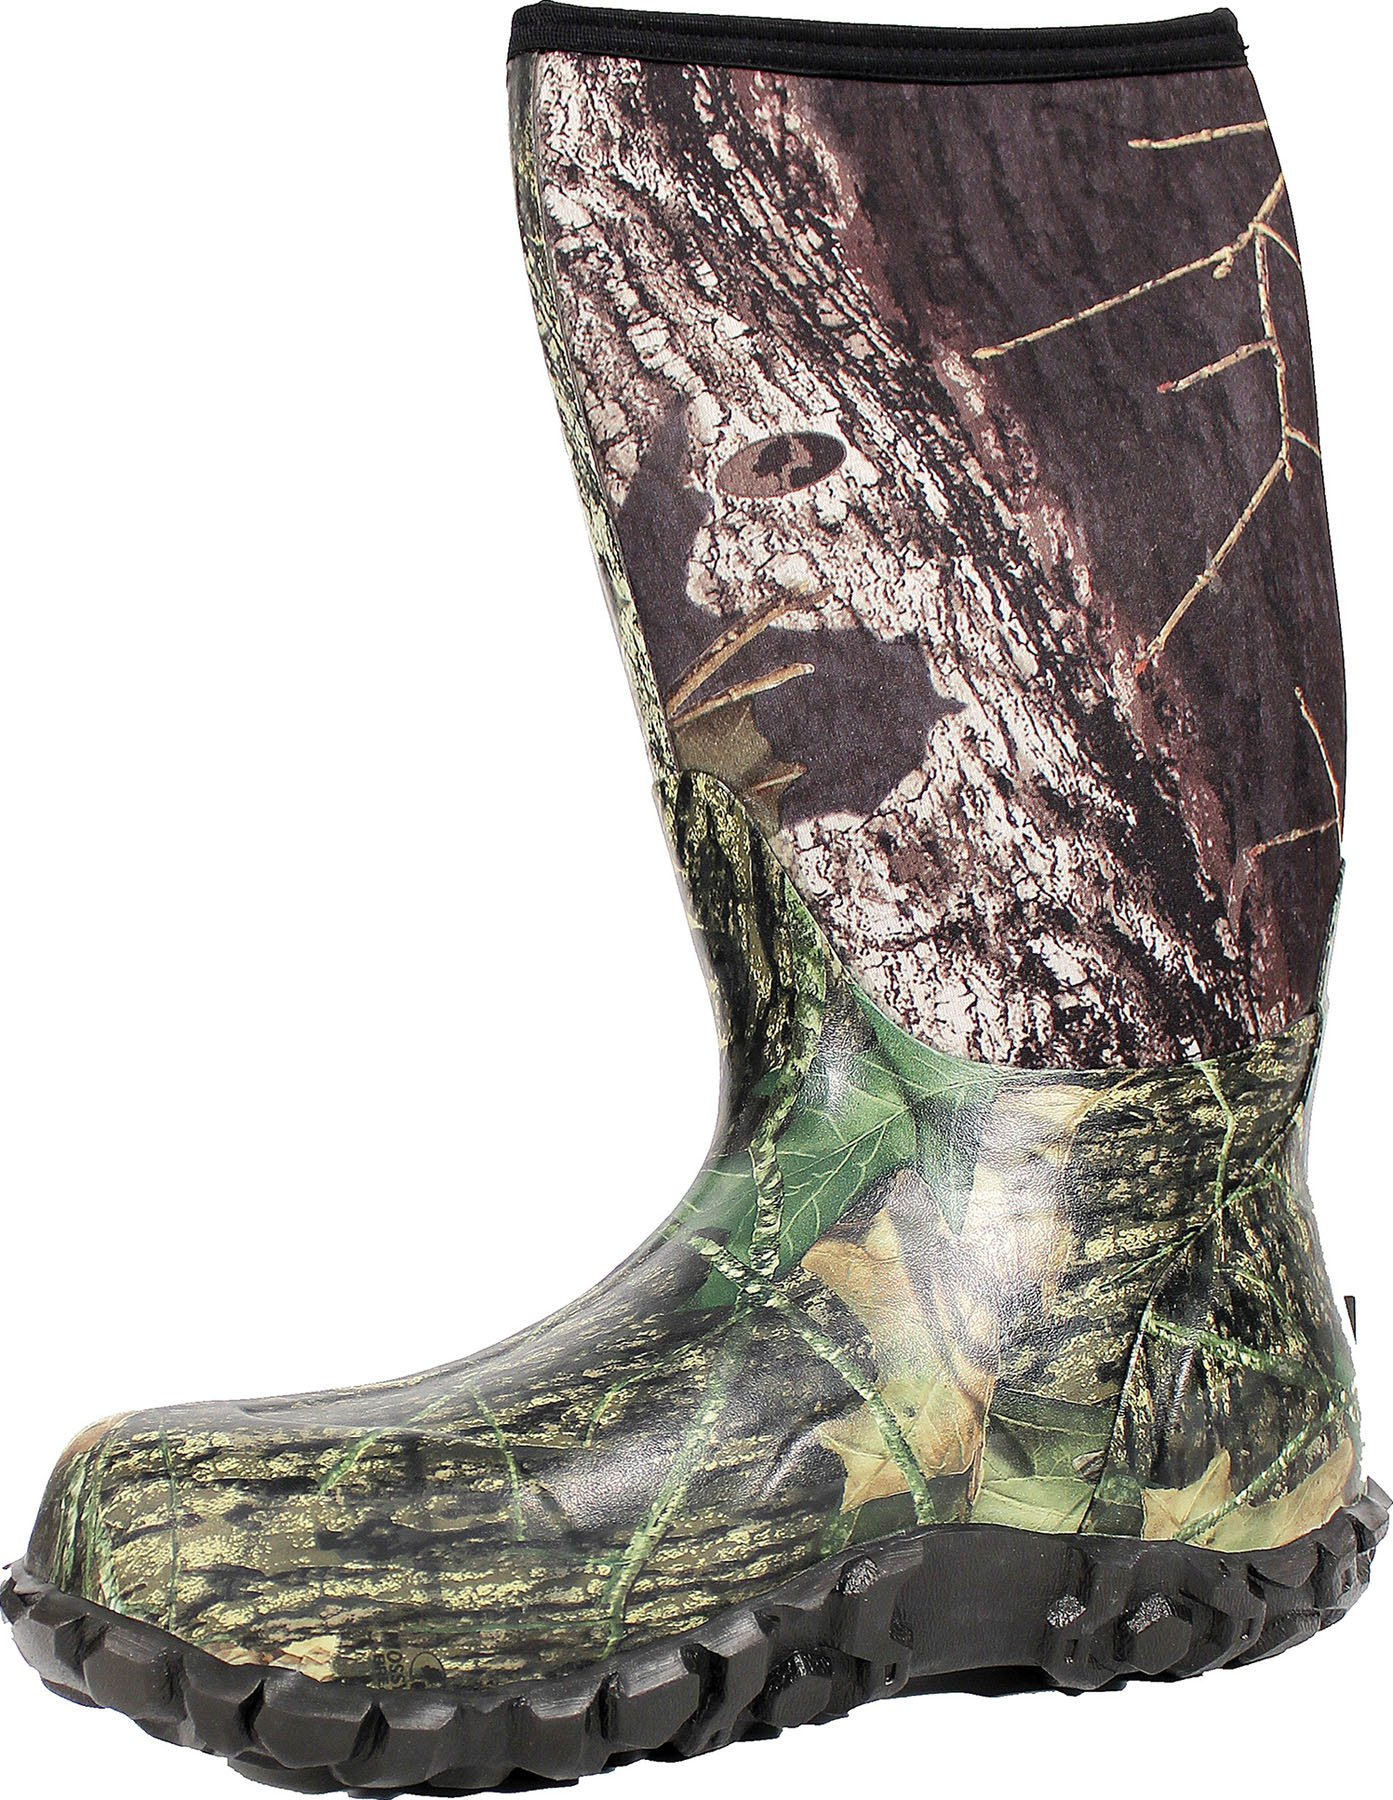 Bogs Men's Classic High Waterproof Insulated Rain Boot, Mossy Oak, 10 D(M) US by BOGS